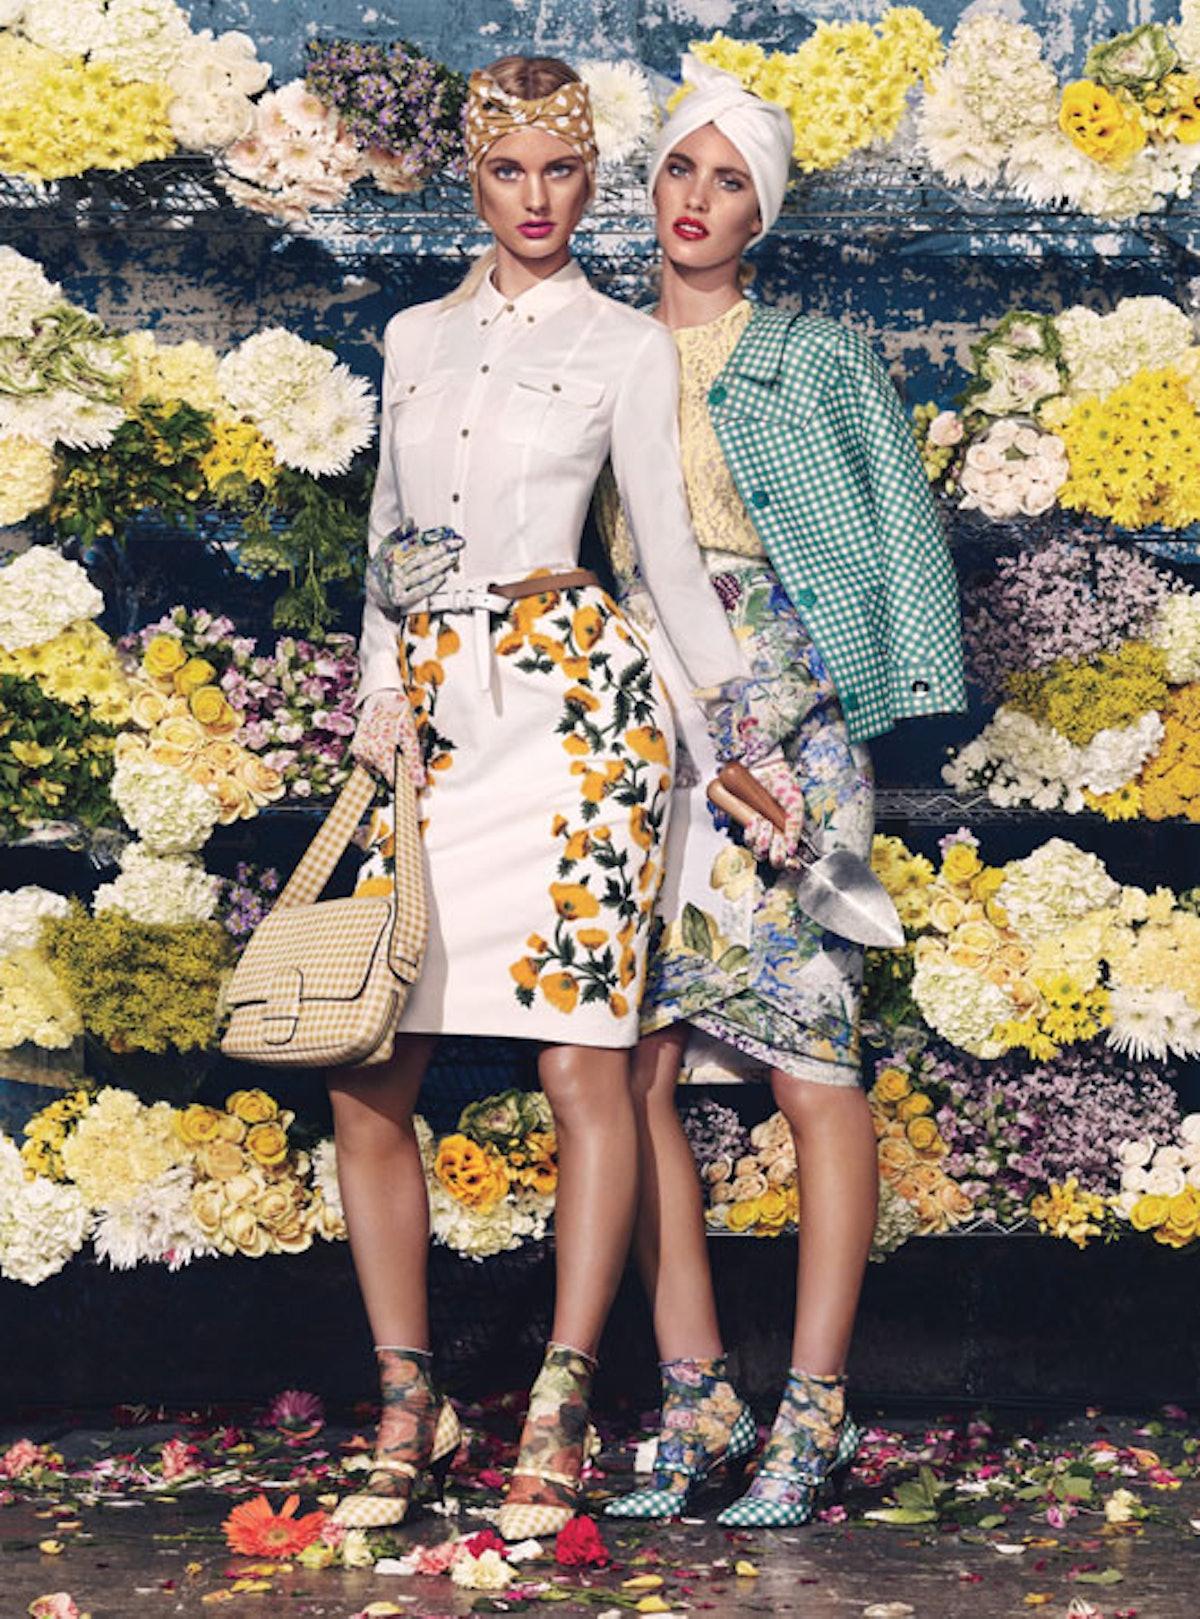 fass-floral-fashion-04-l.jpg